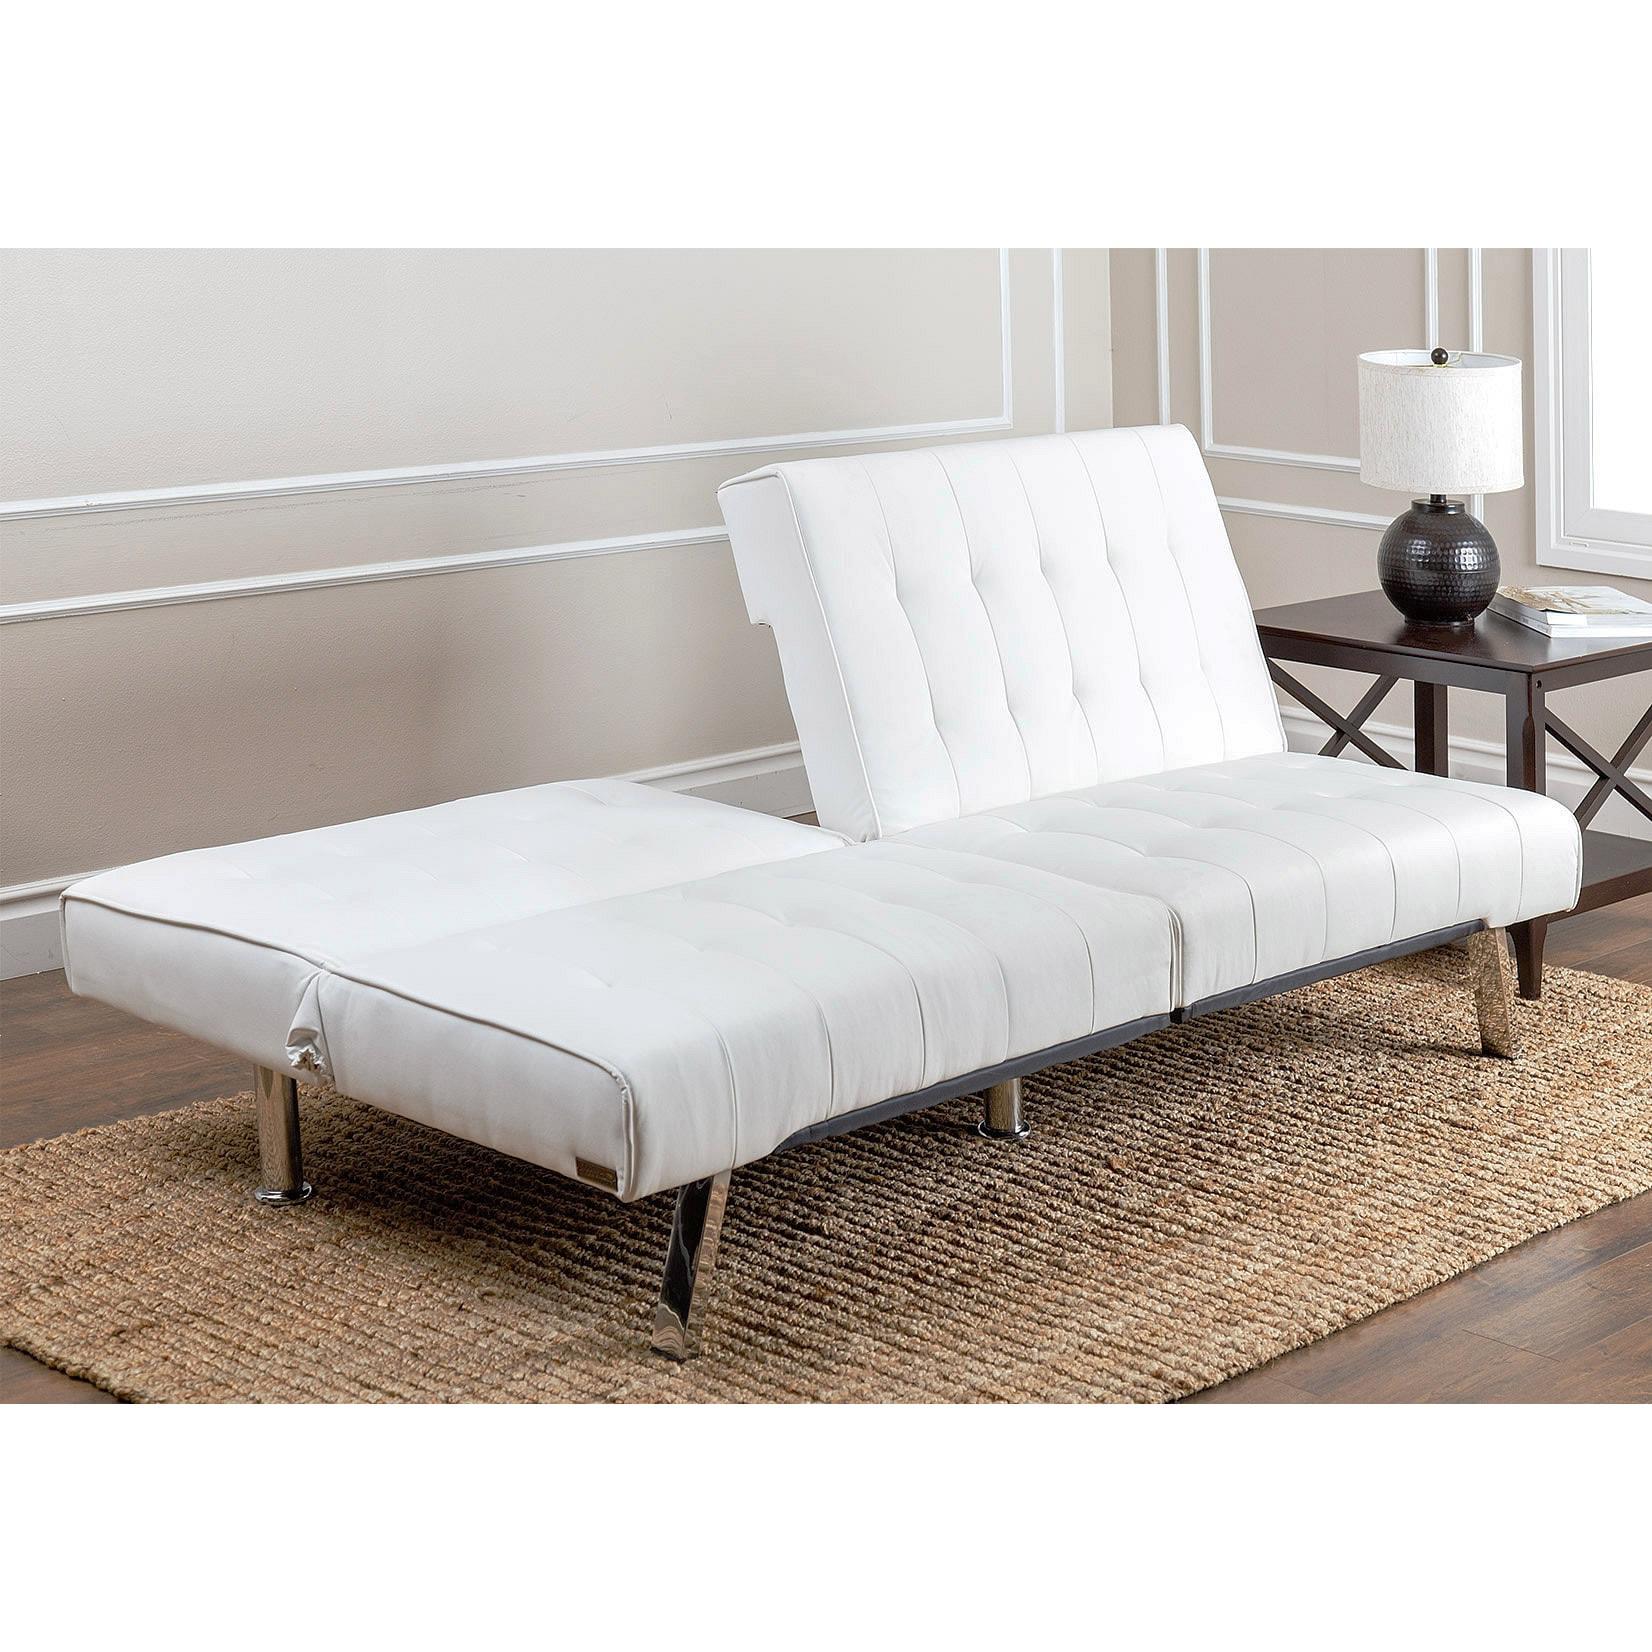 Abbyson Jackson Ivory Leather Foldable Futon Sofa Bed On Free Shipping Today Com 9829805